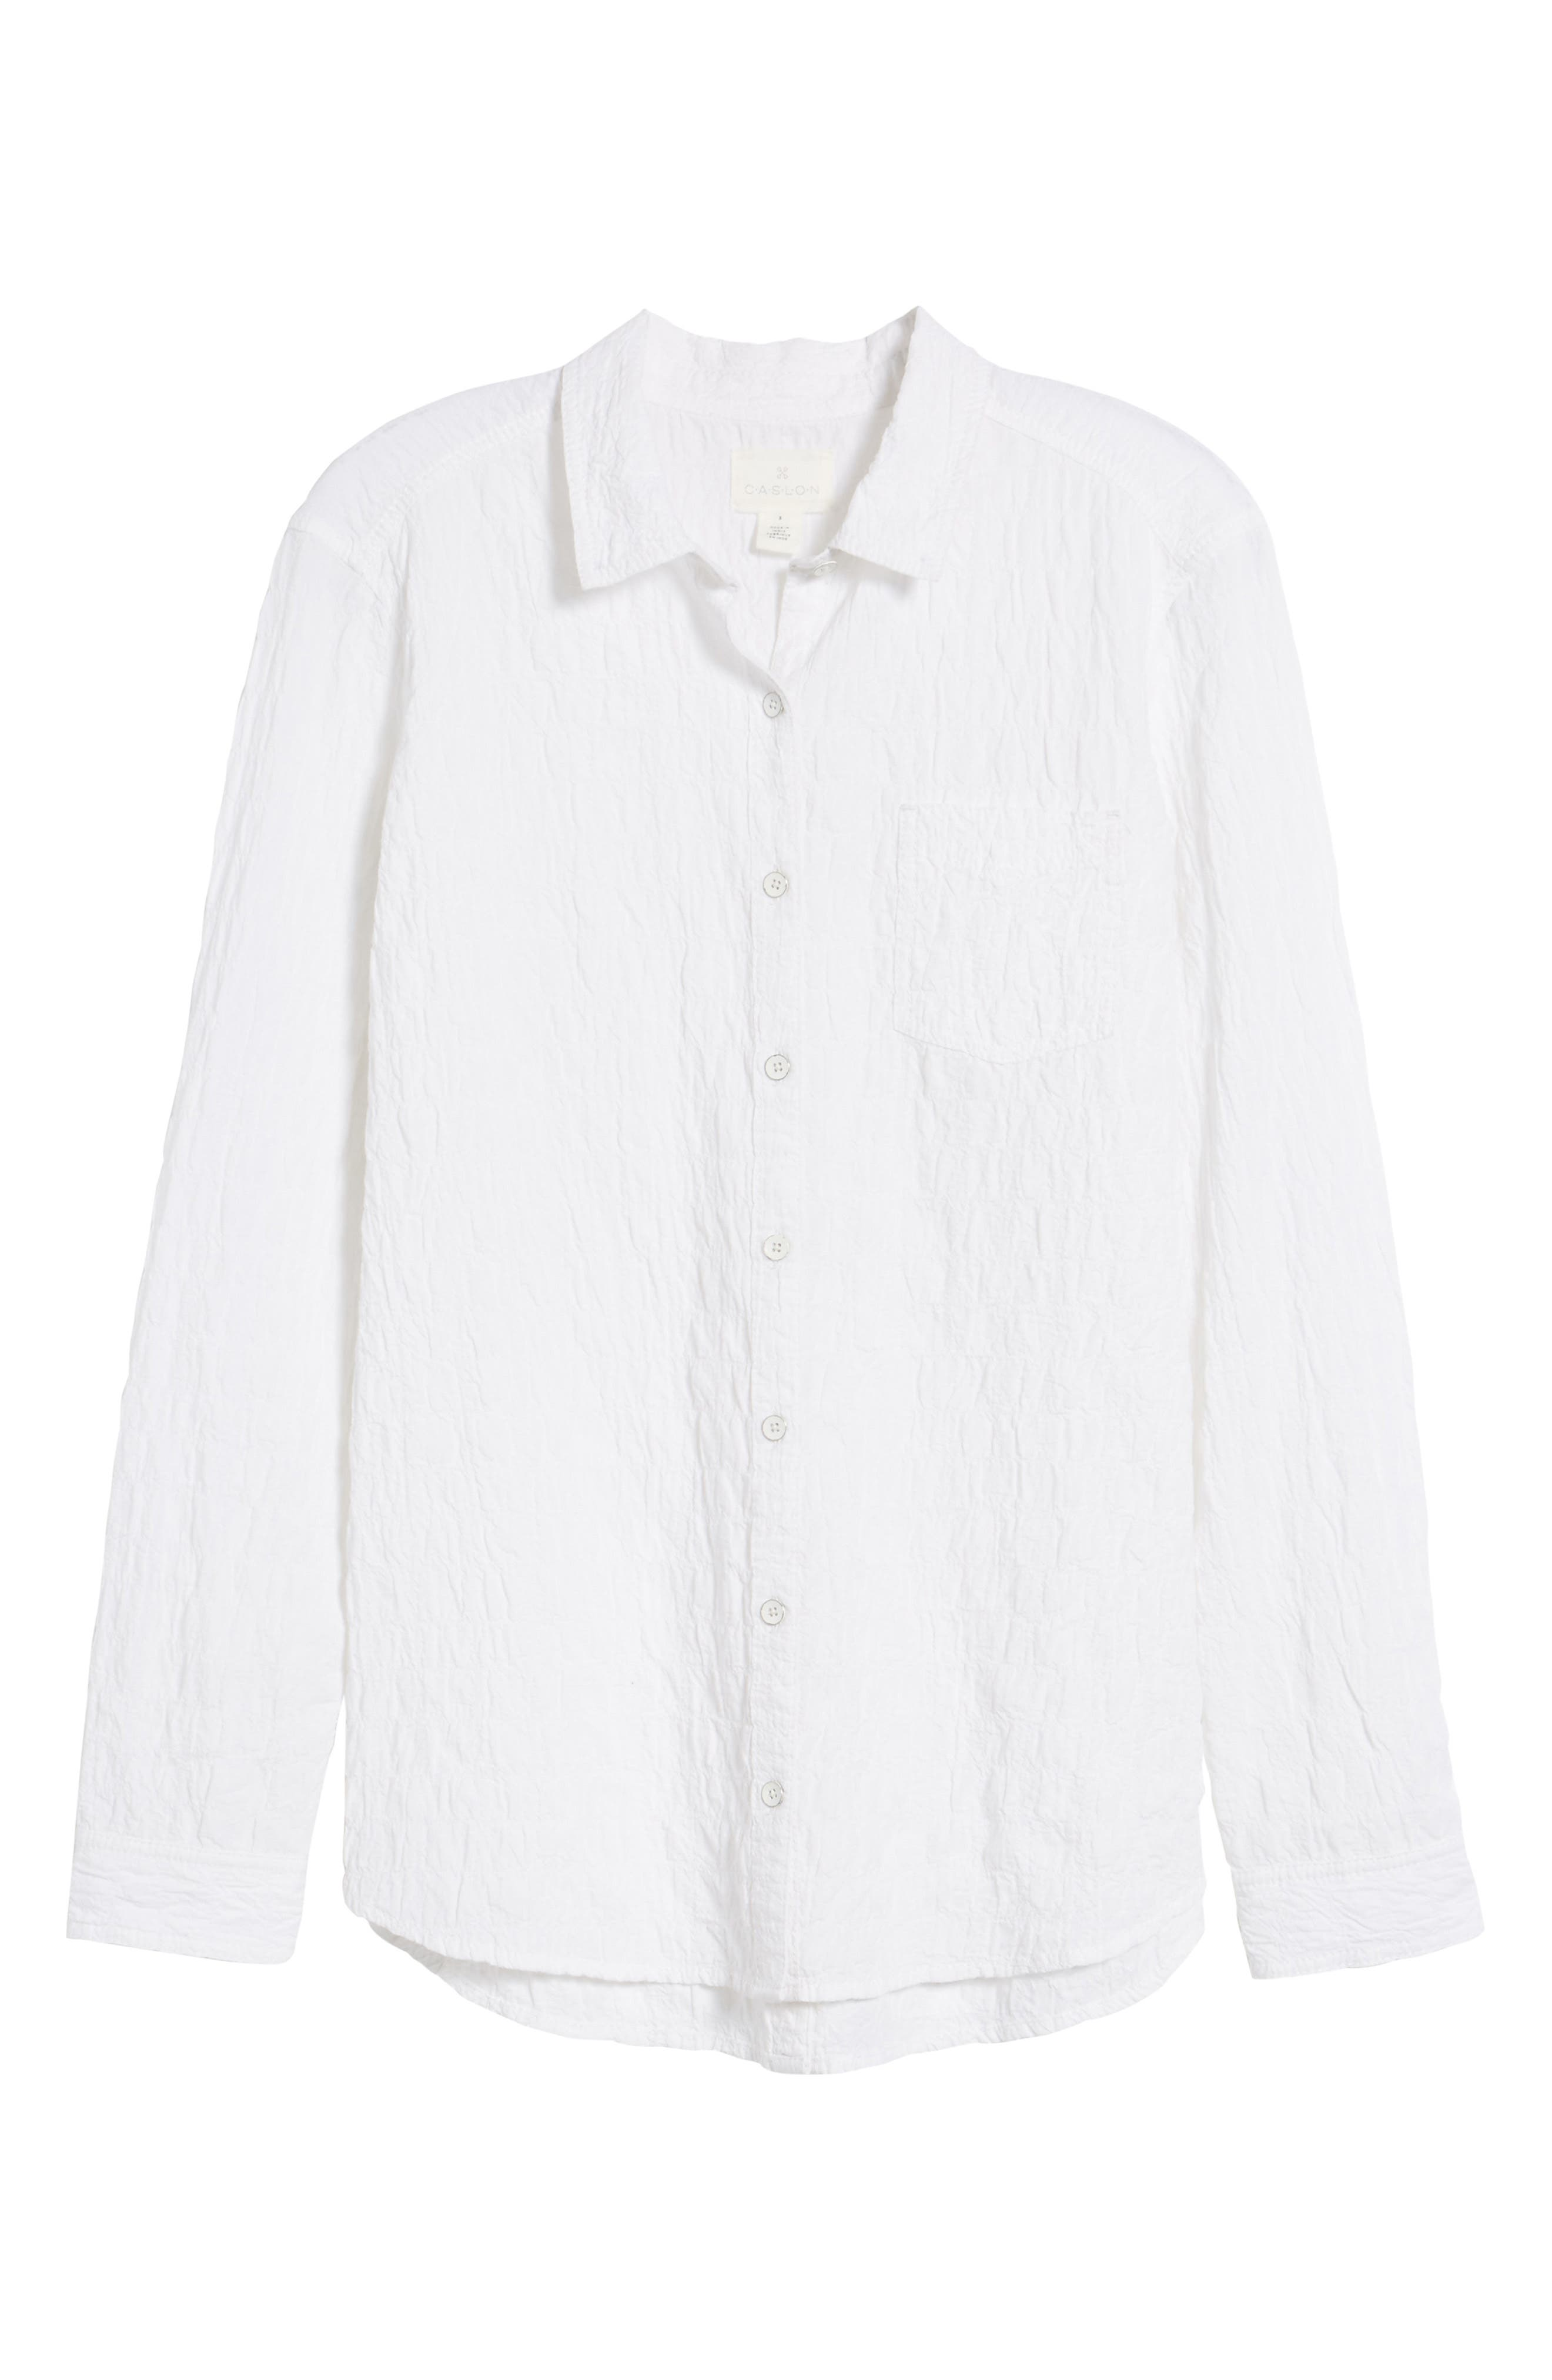 Button Up Shirt,                             Alternate thumbnail 6, color,                             White